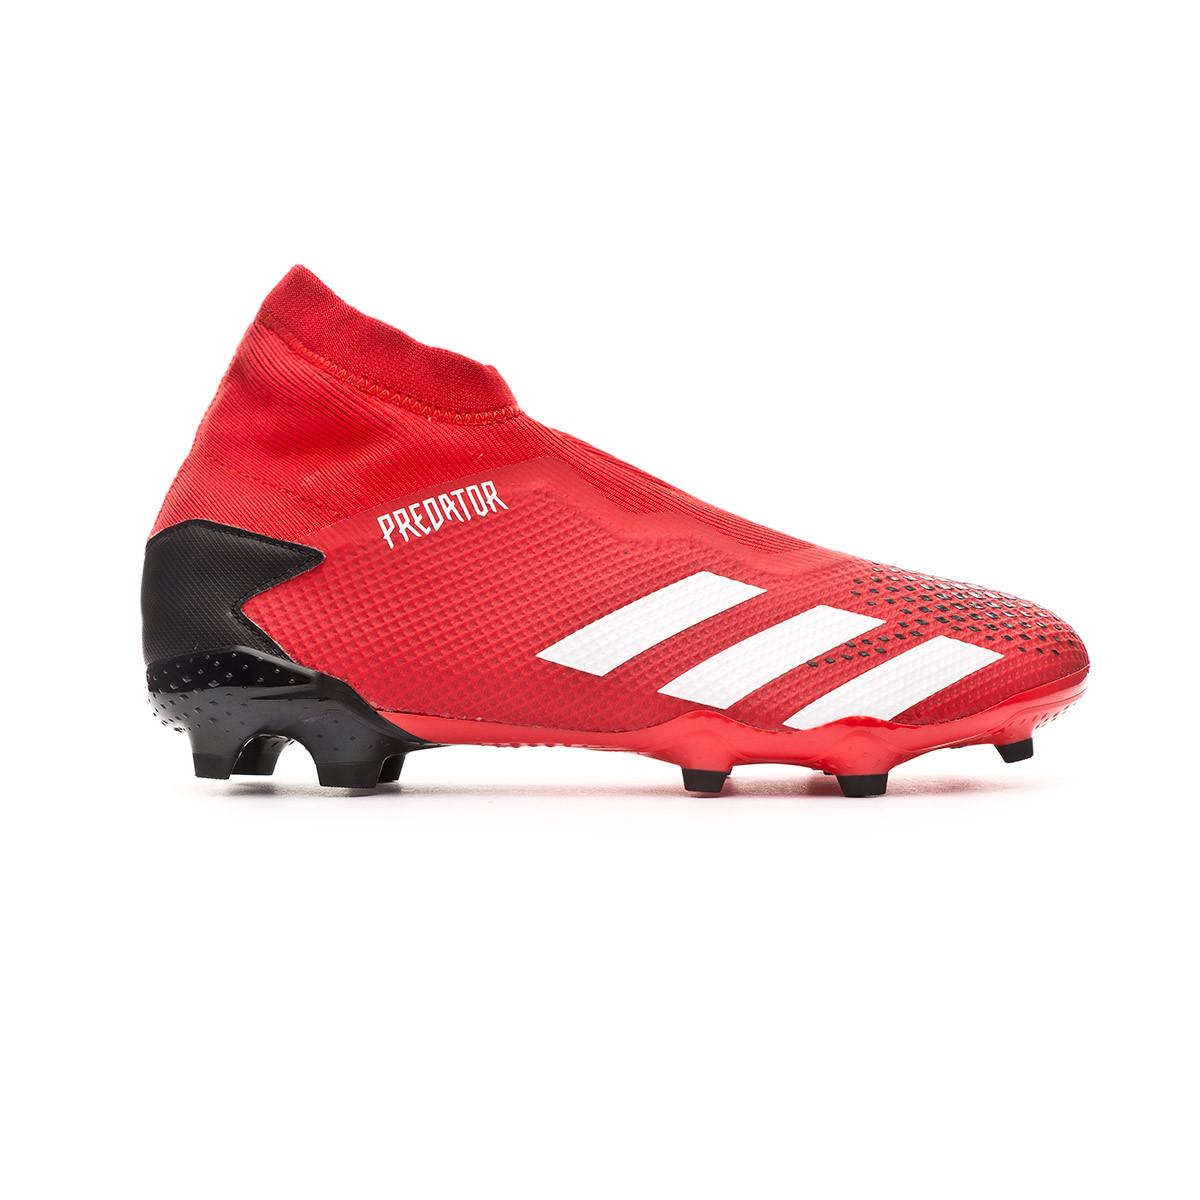 cristiandad novia brandy  Bota de fútbol adidas Predator 20.3 LL FG Active red-White-Core black -  Tienda de fútbol Fútbol Emotion